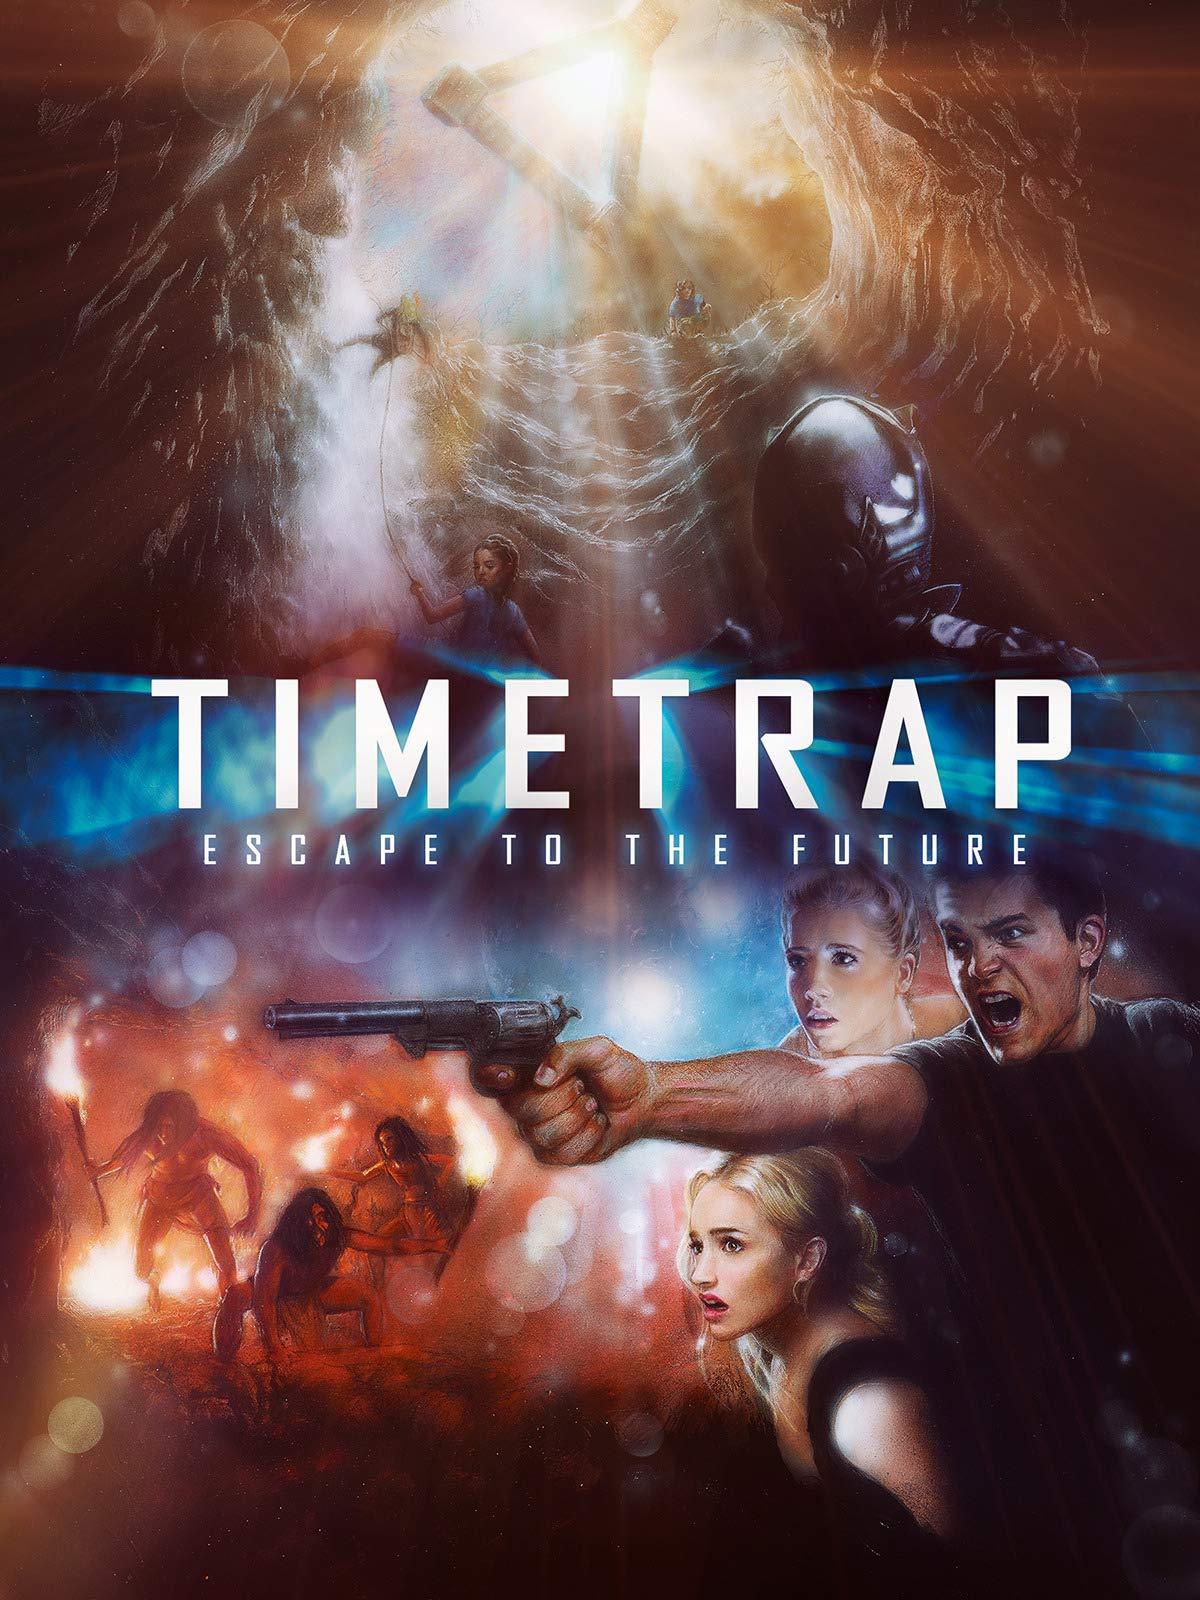 Amazon.com: Watch Time Trap | Prime Video